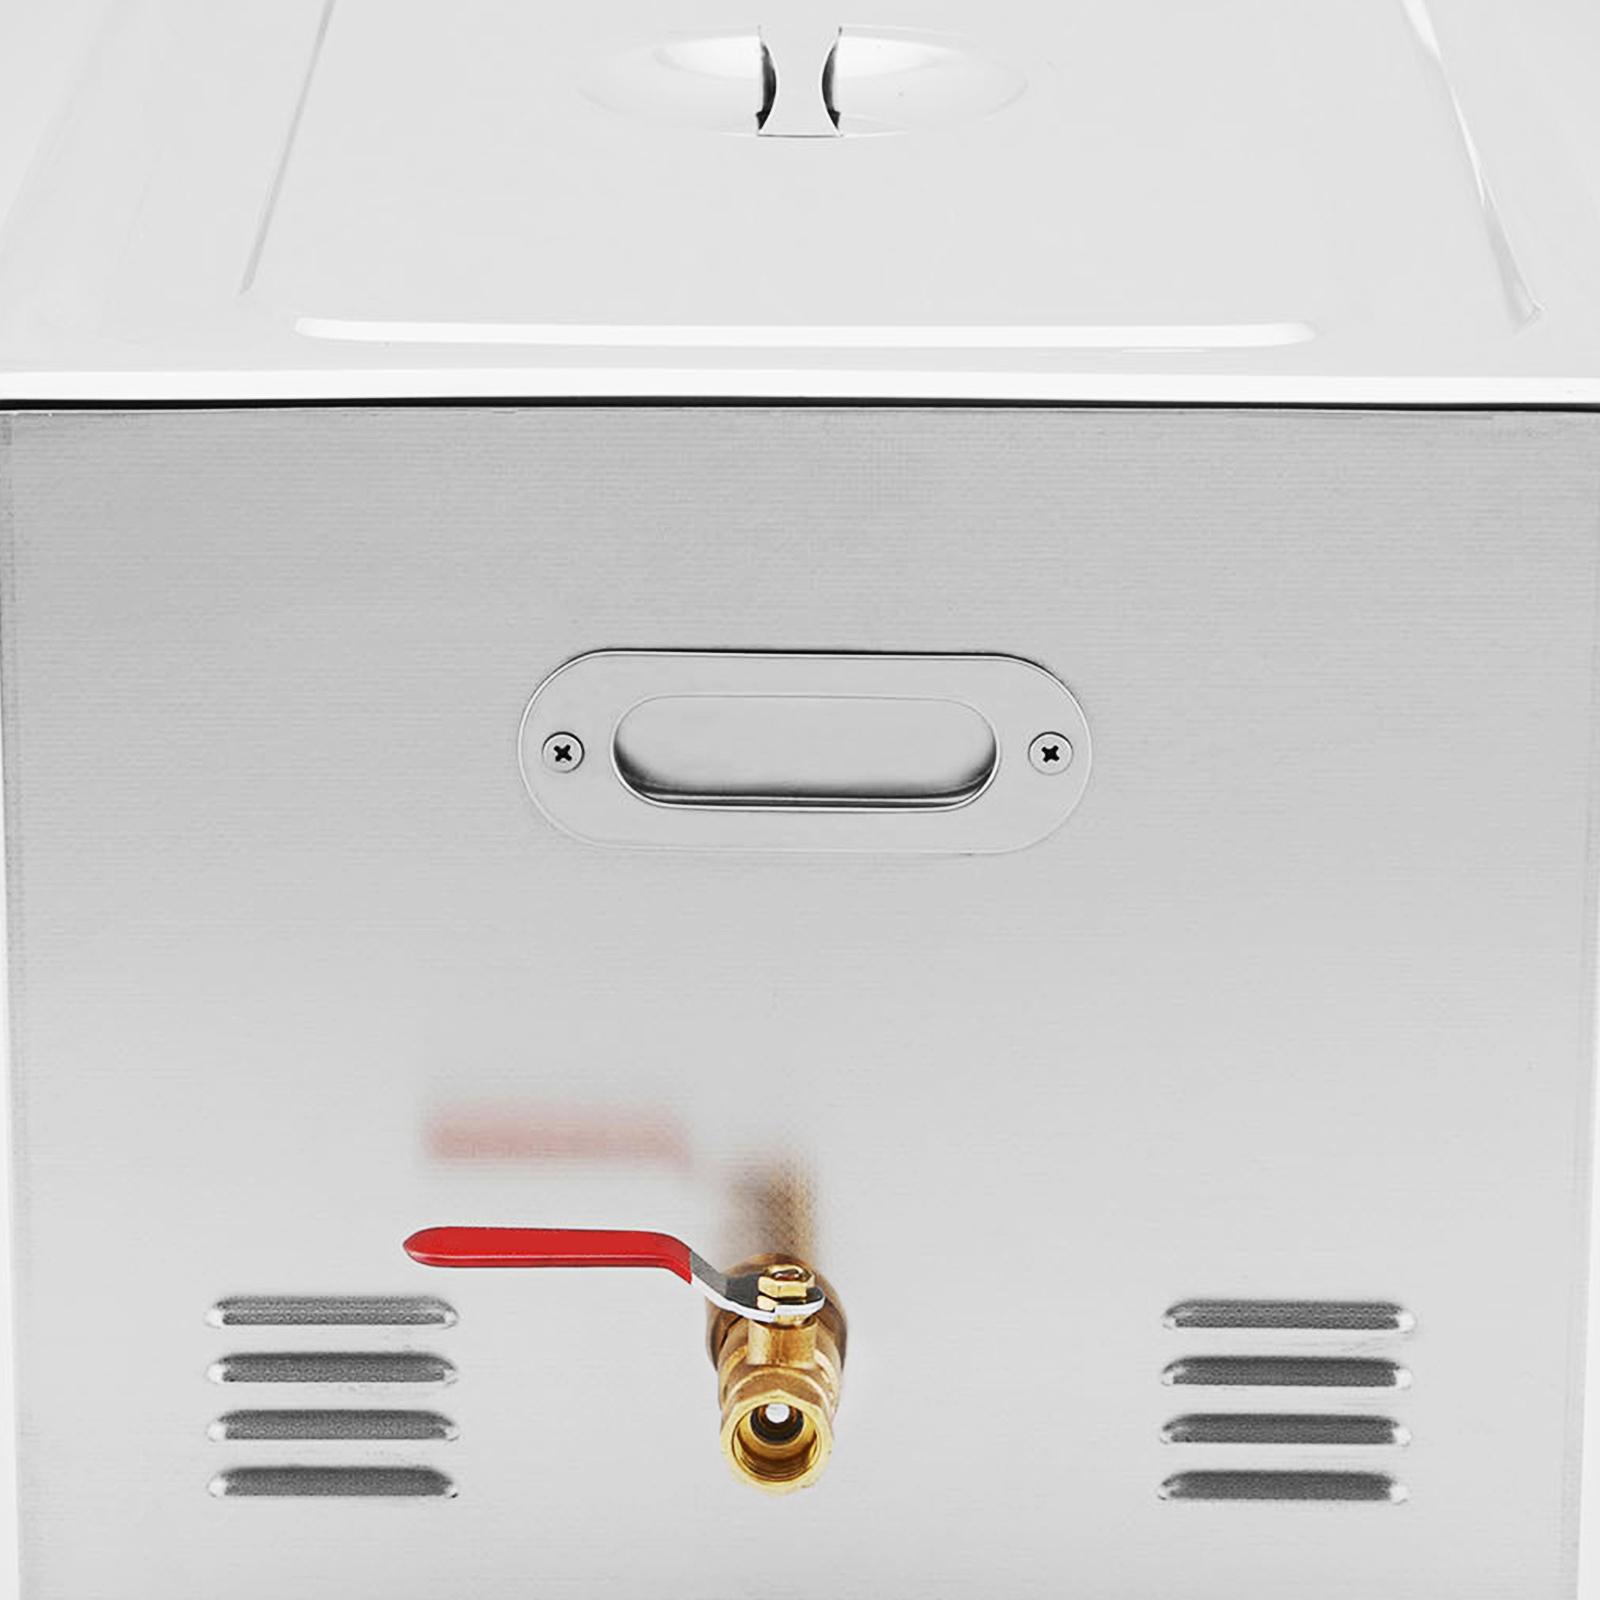 Vaschetta-Vasca-Ultrasuoni-Lavatrice-Pulitore-Ad-Ultrasuoni miniatura 94